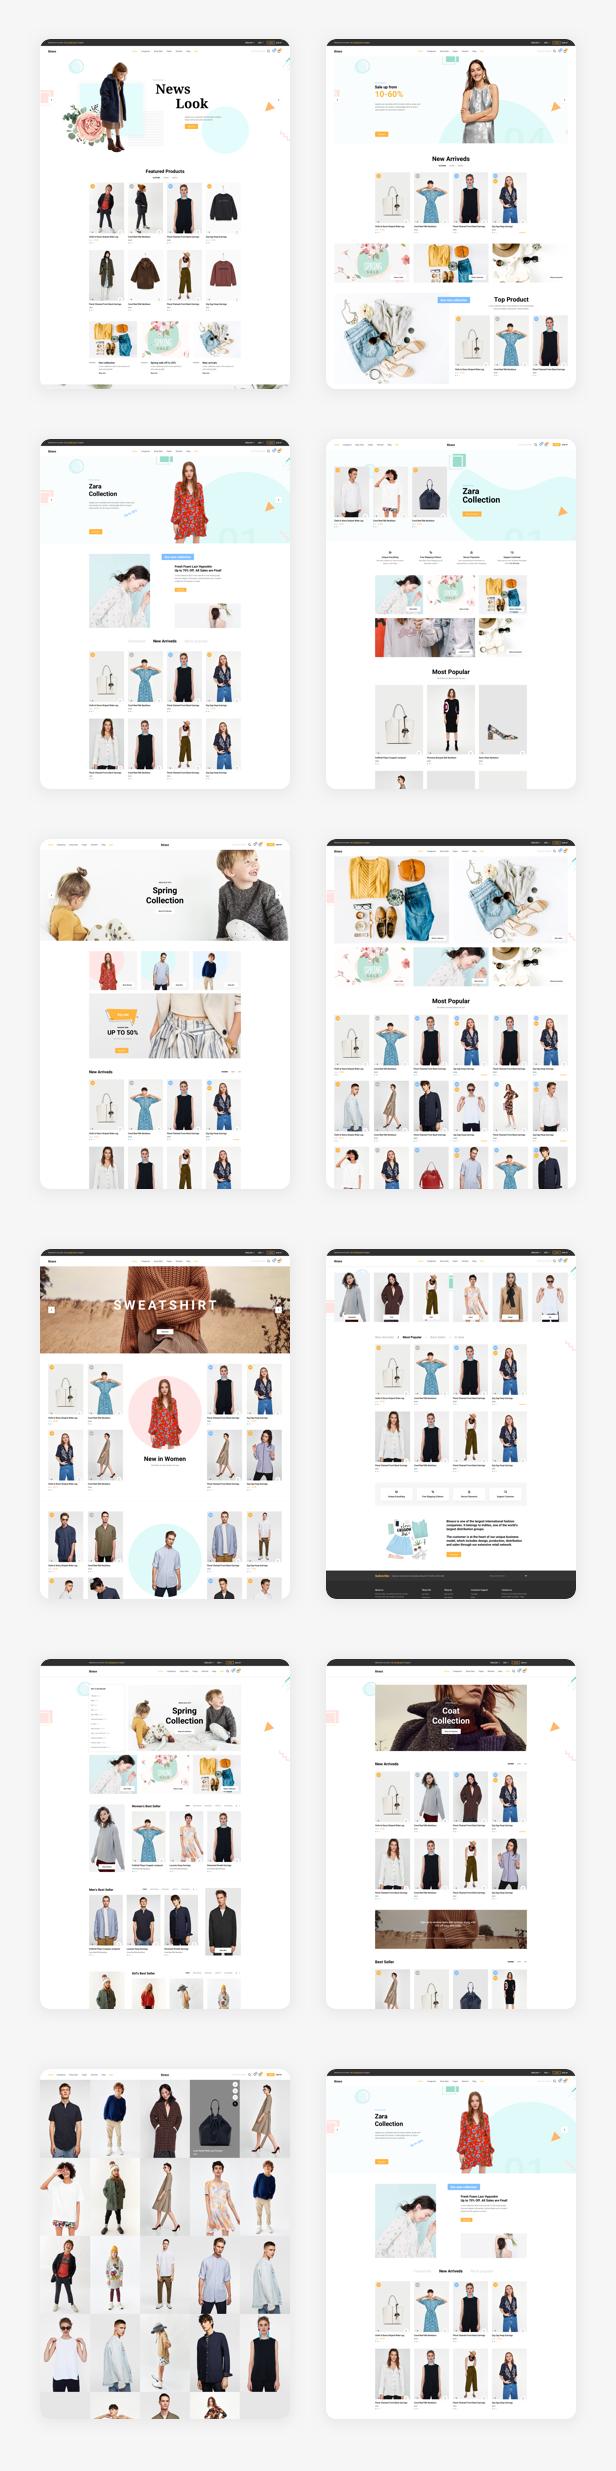 Binace - Fashion eCommerce Sketch Template - 1